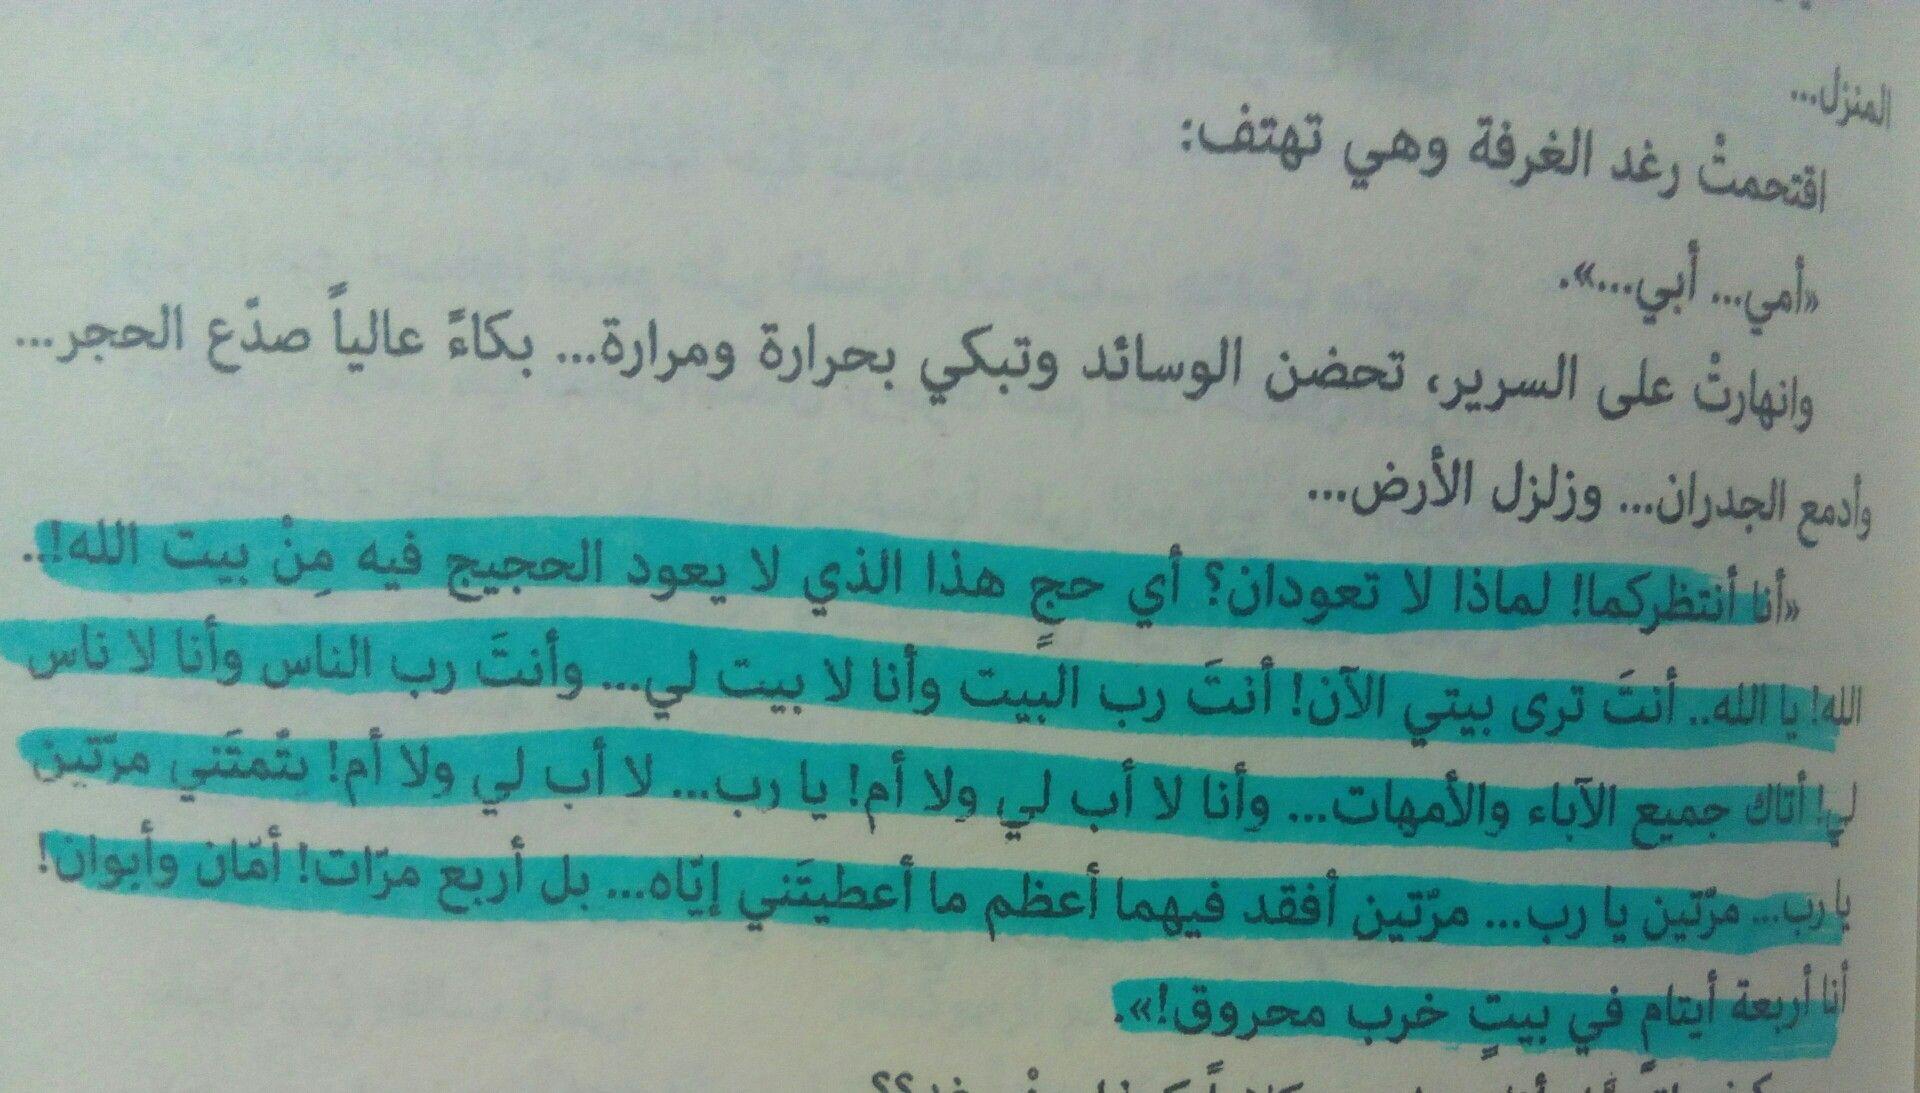 روايه انت لي Arabic Calligraphy Calligraphy